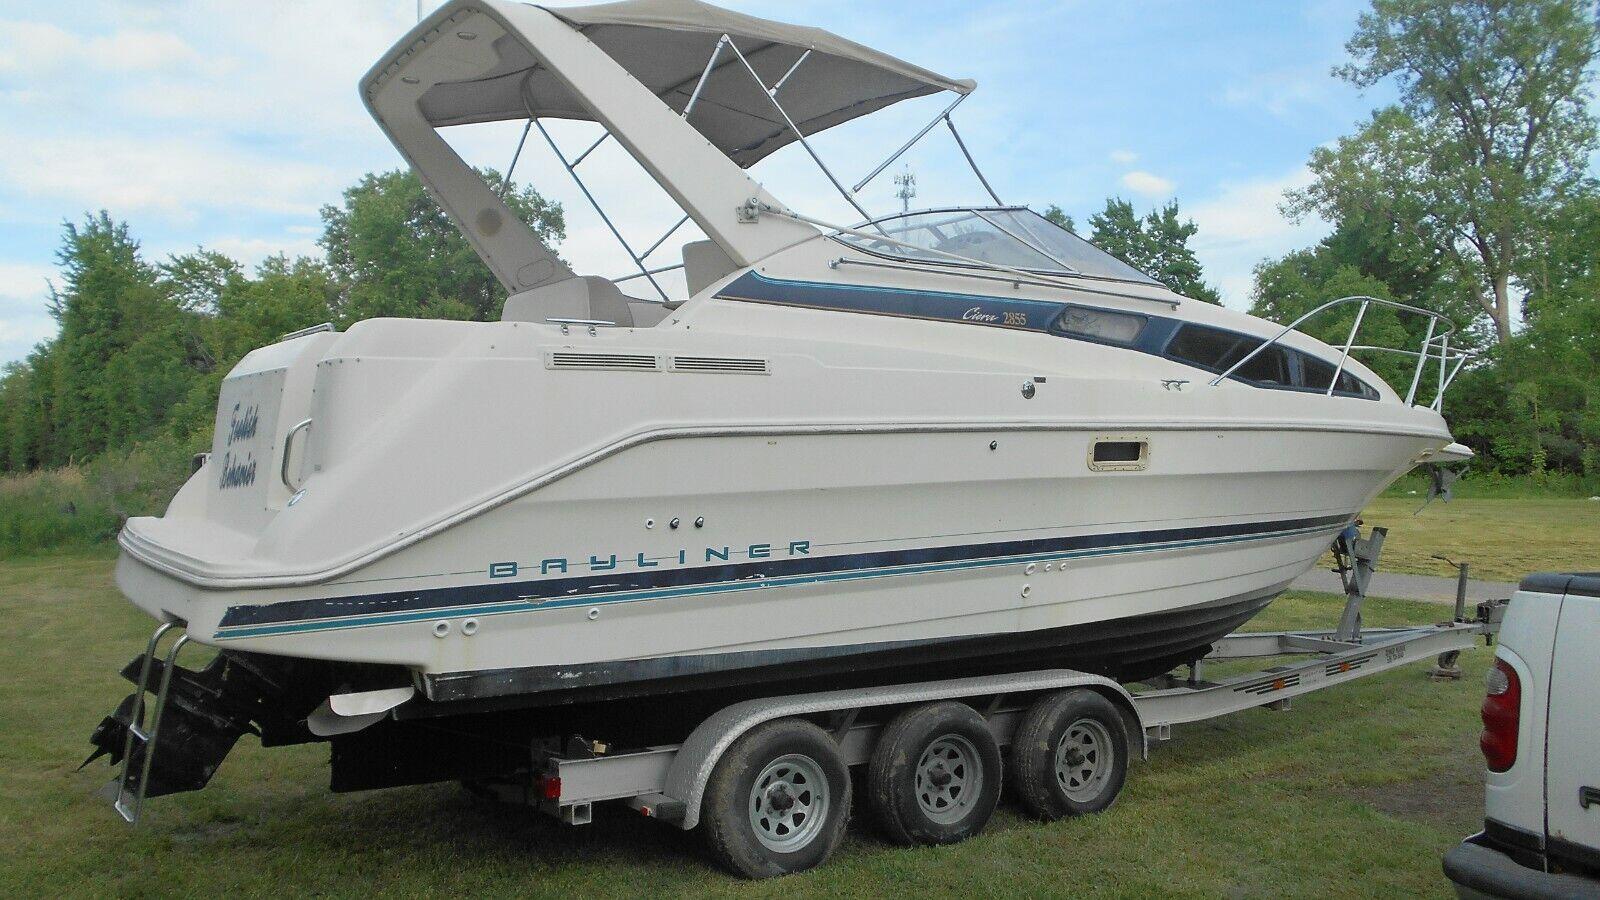 1996 Bayliner Ciera 2855 Yacht Cabin Cruiser with Tri Axle Aluminum Boat Trailer